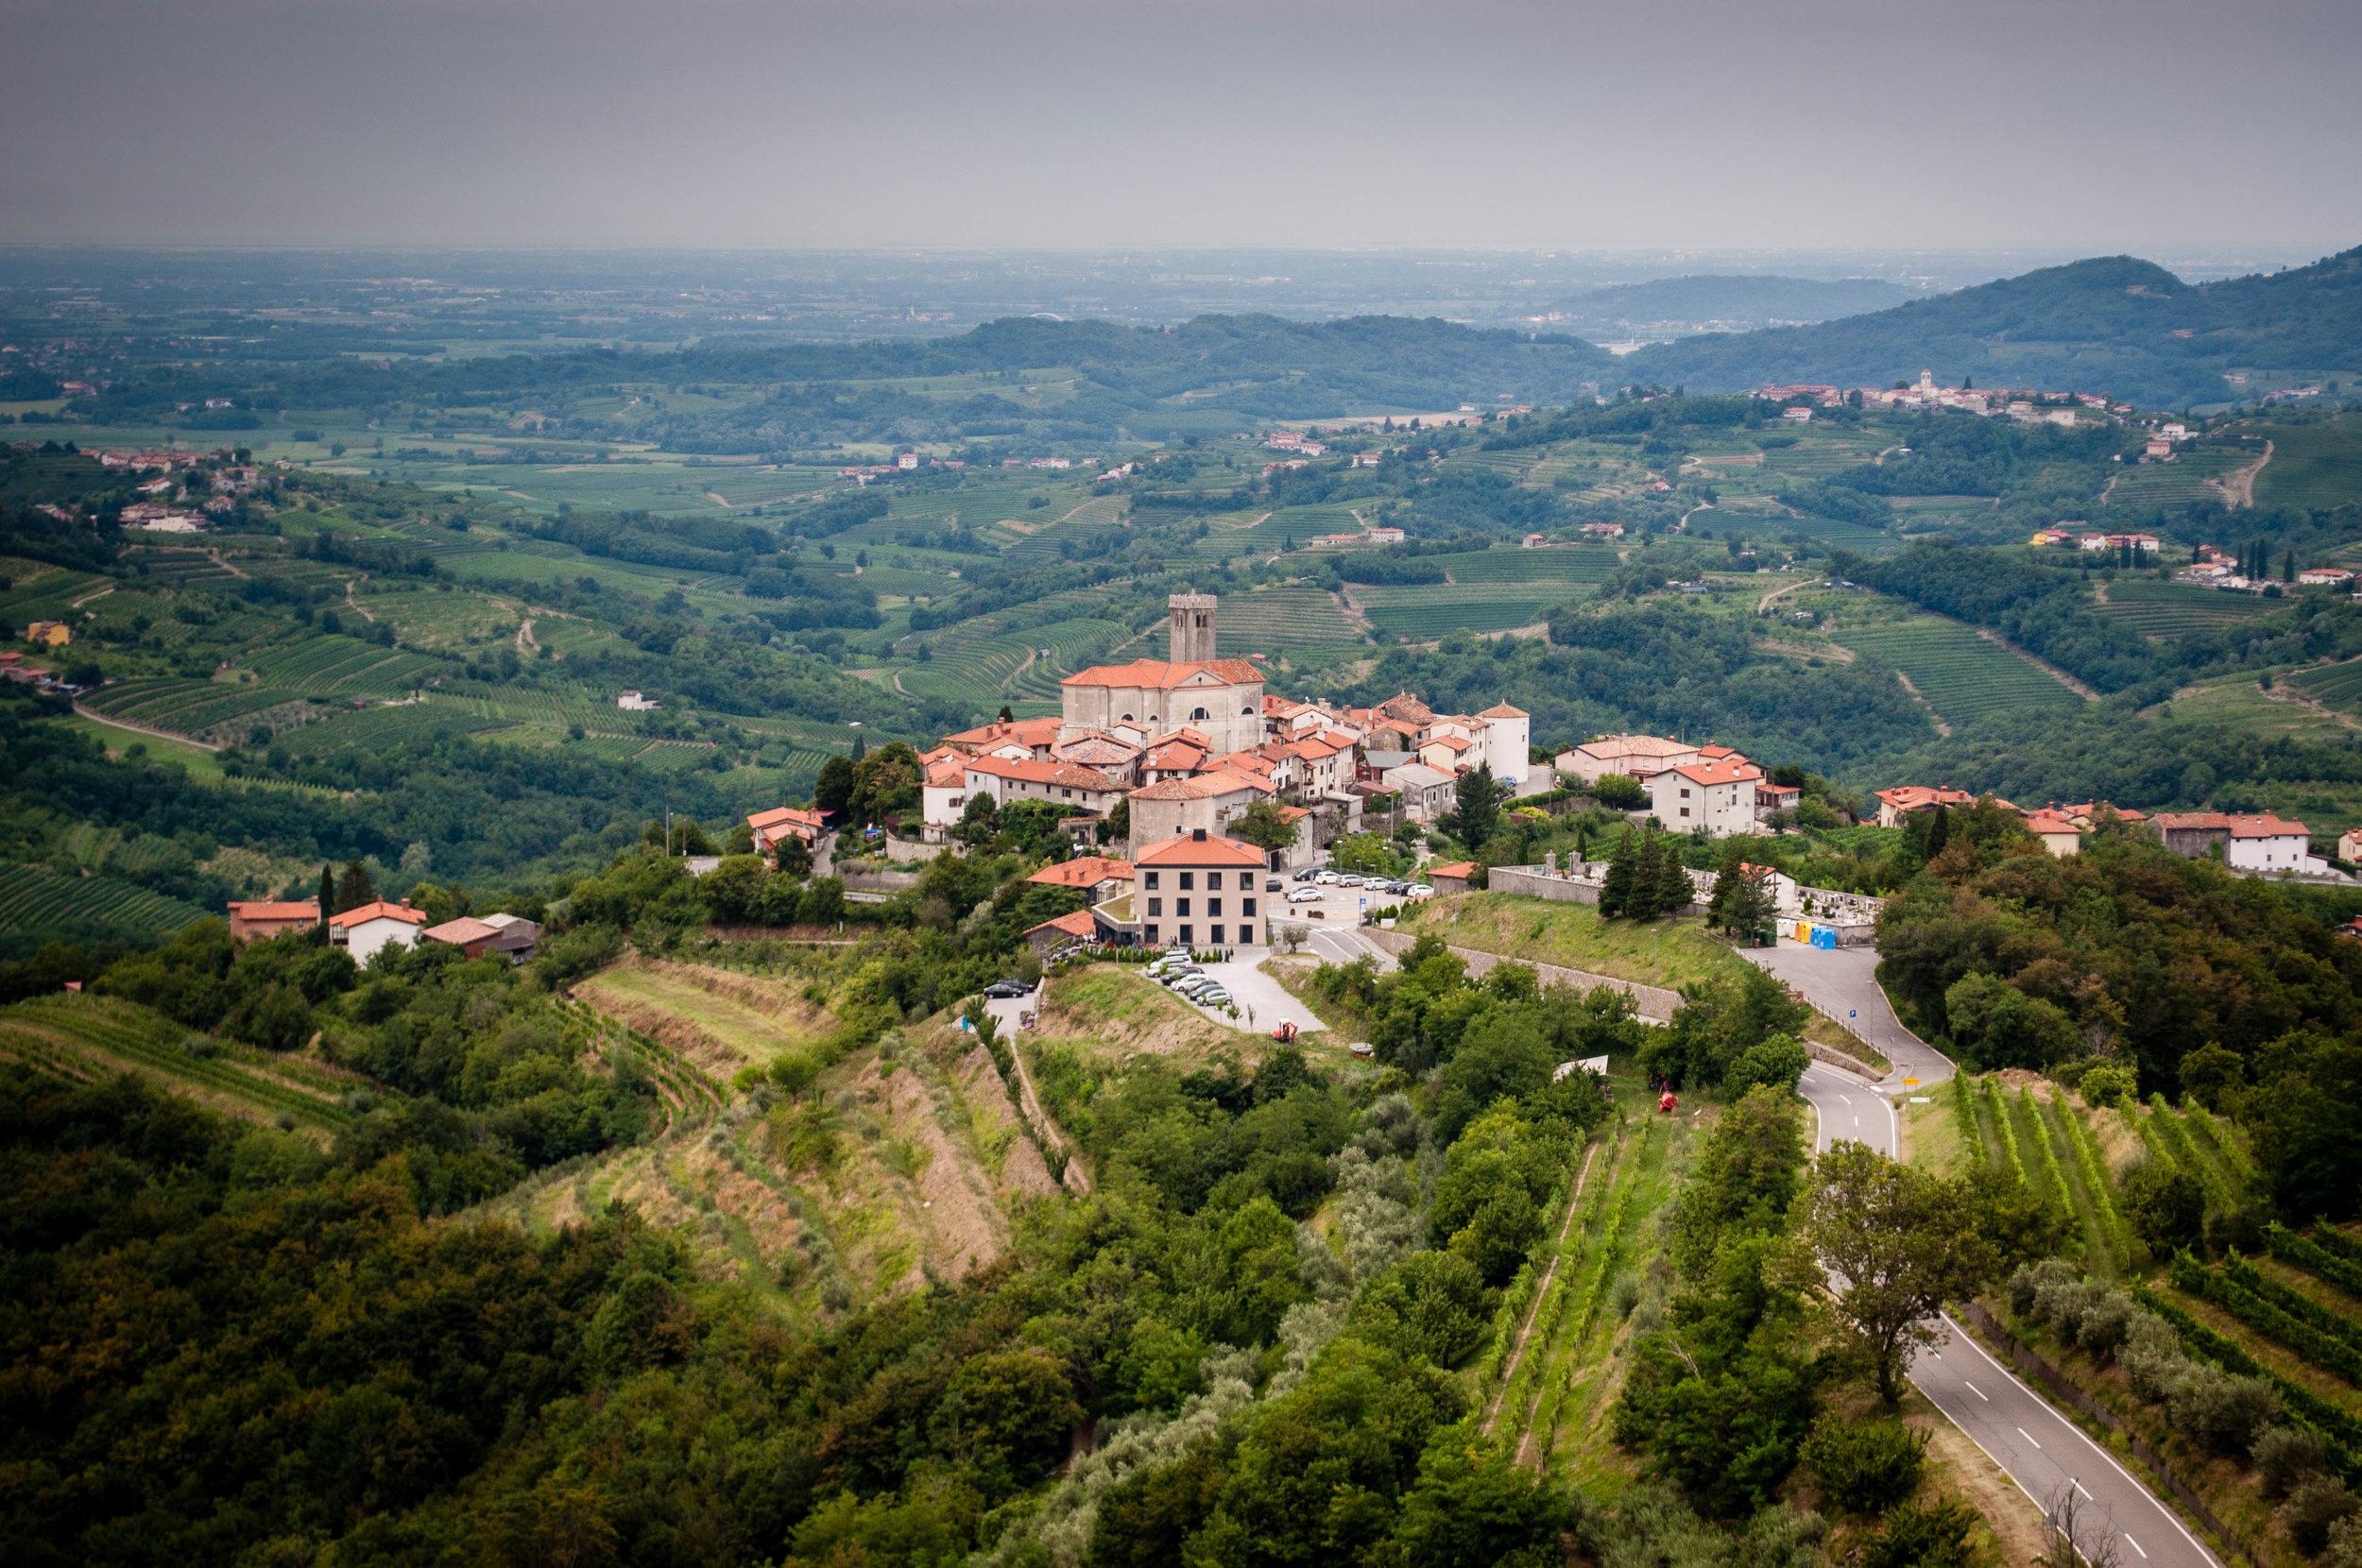 Exploring the Slovenia wine region